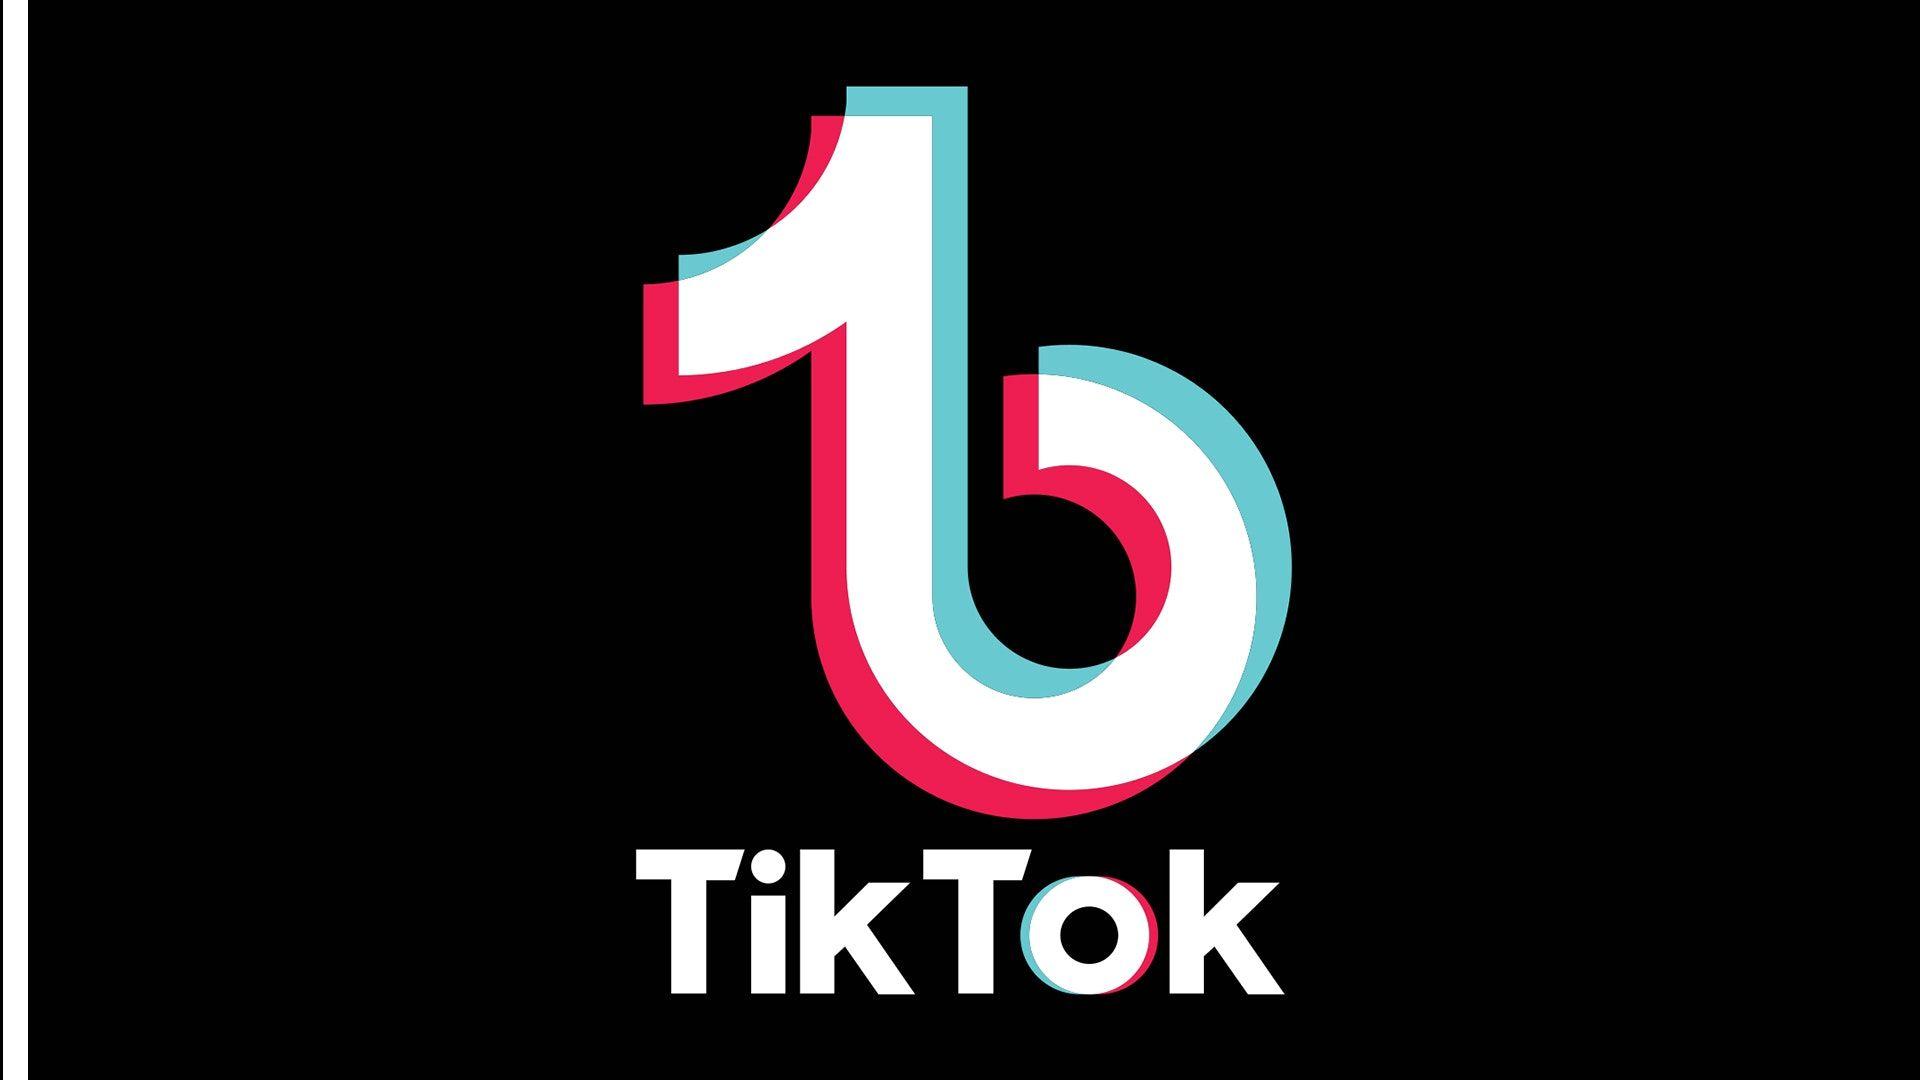 TikTok Logo HD Wallpapers - Wallpaper Cave